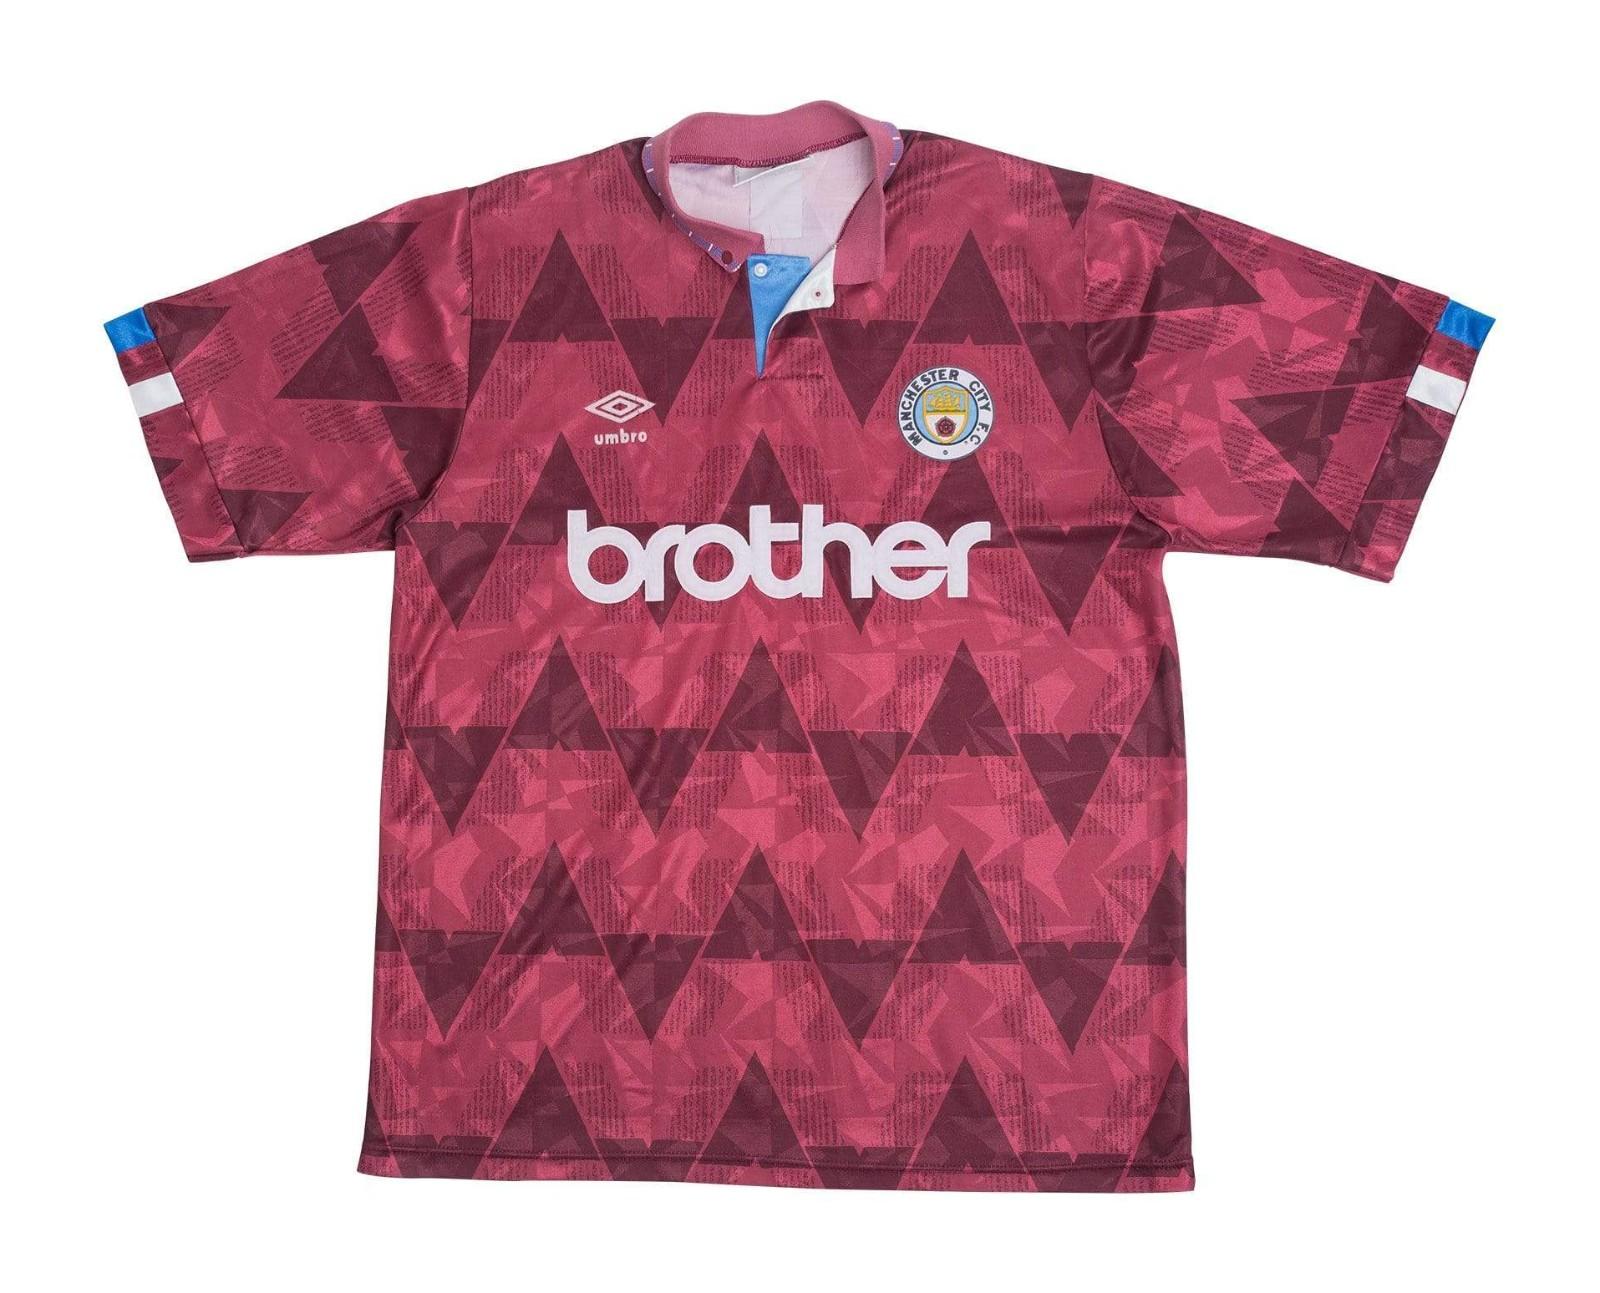 Manchester City 1990-91 Away Kit